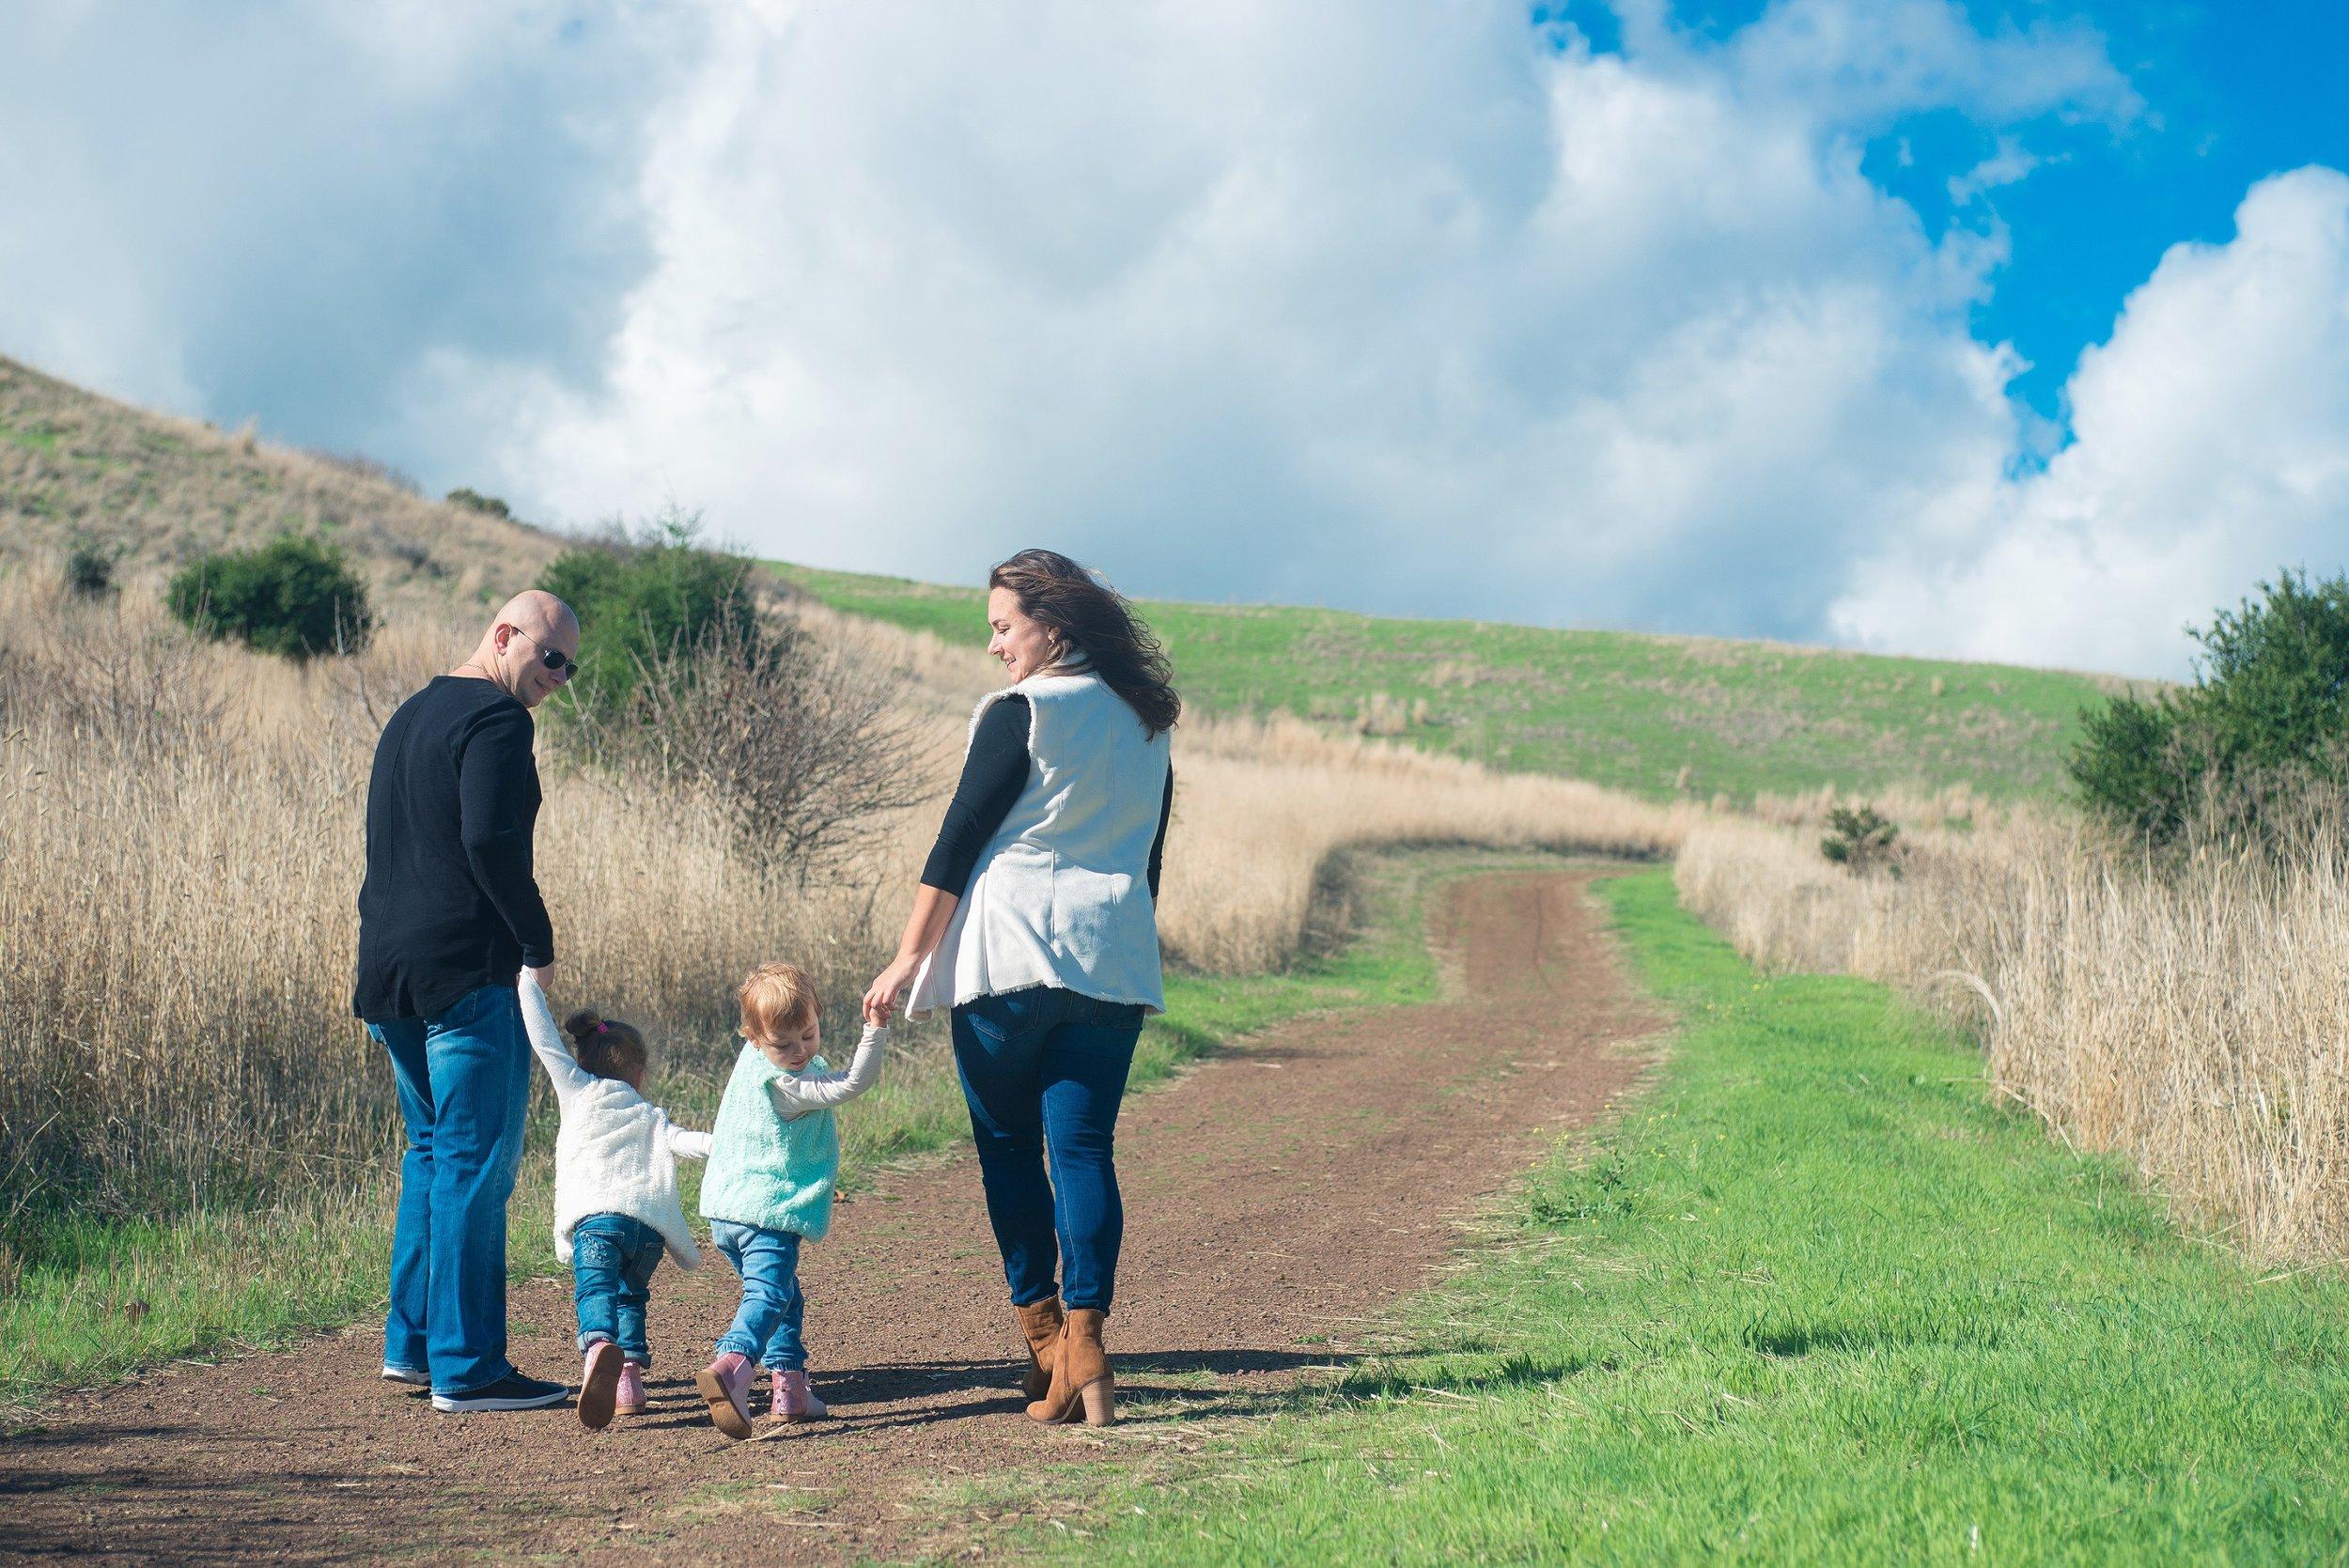 J6 - Hiking Family.jpeg